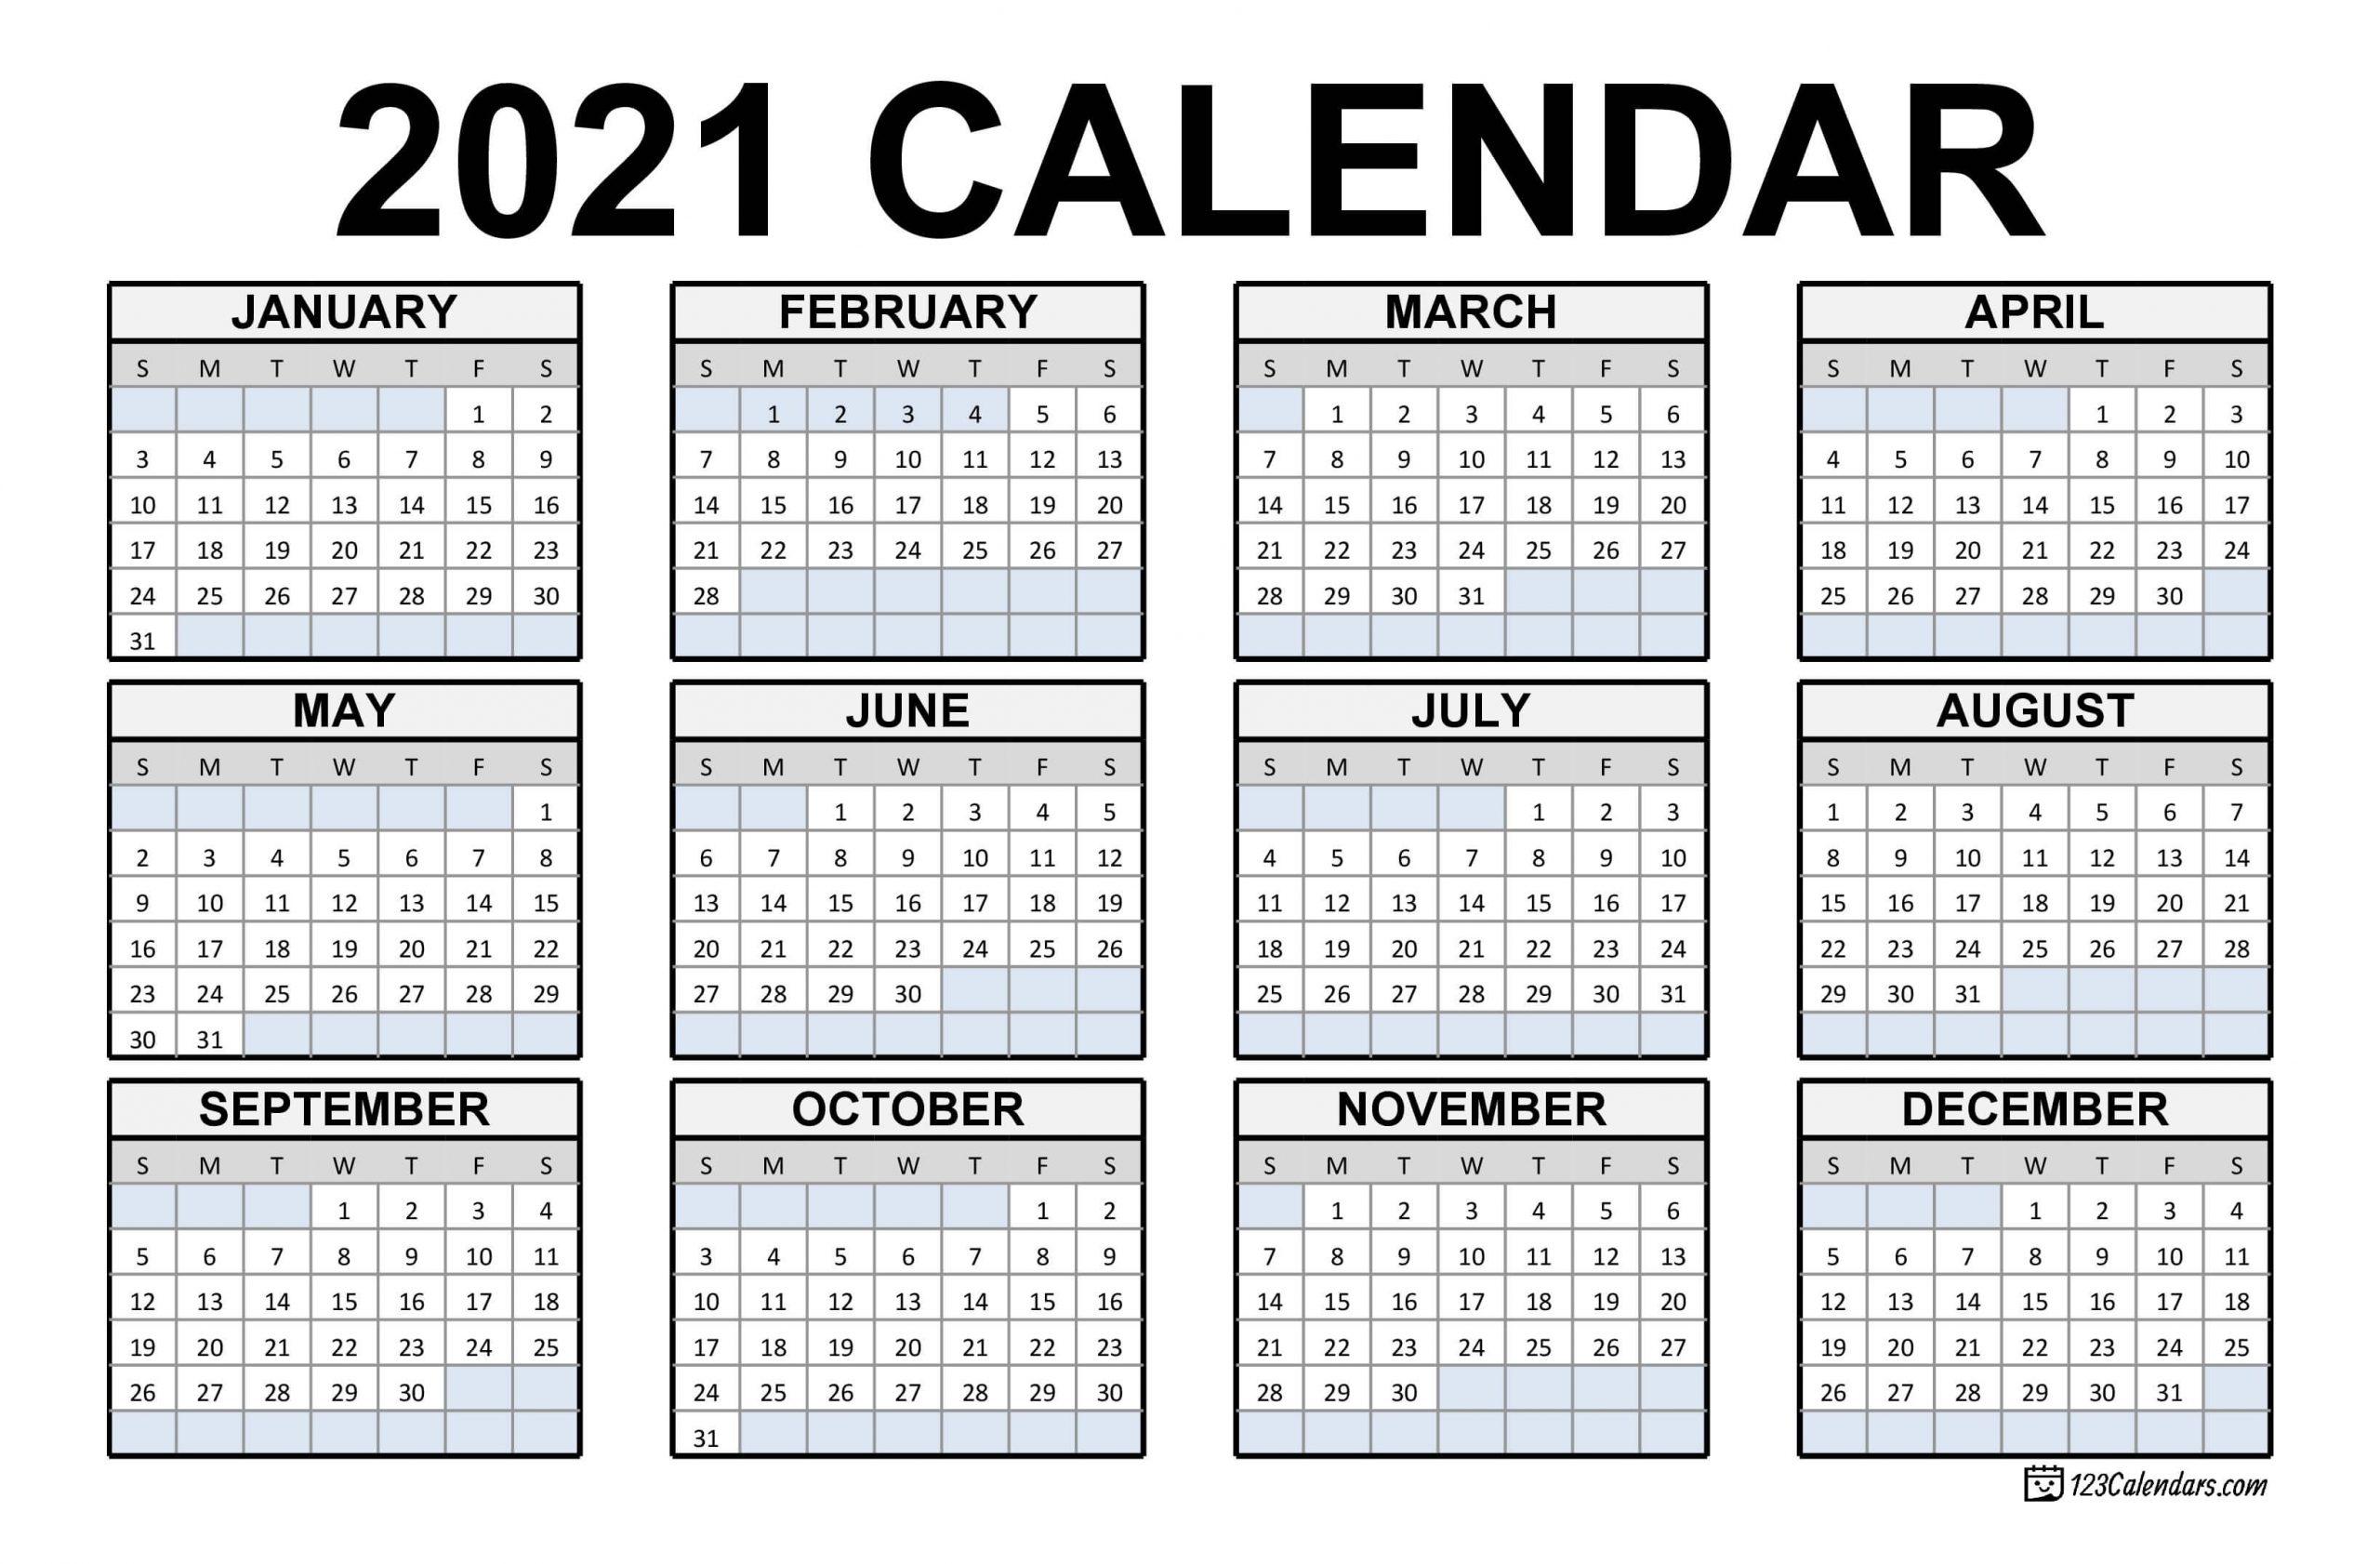 2021 Printable Calendar   123Calendars-Fill In Blank Calendar 2021